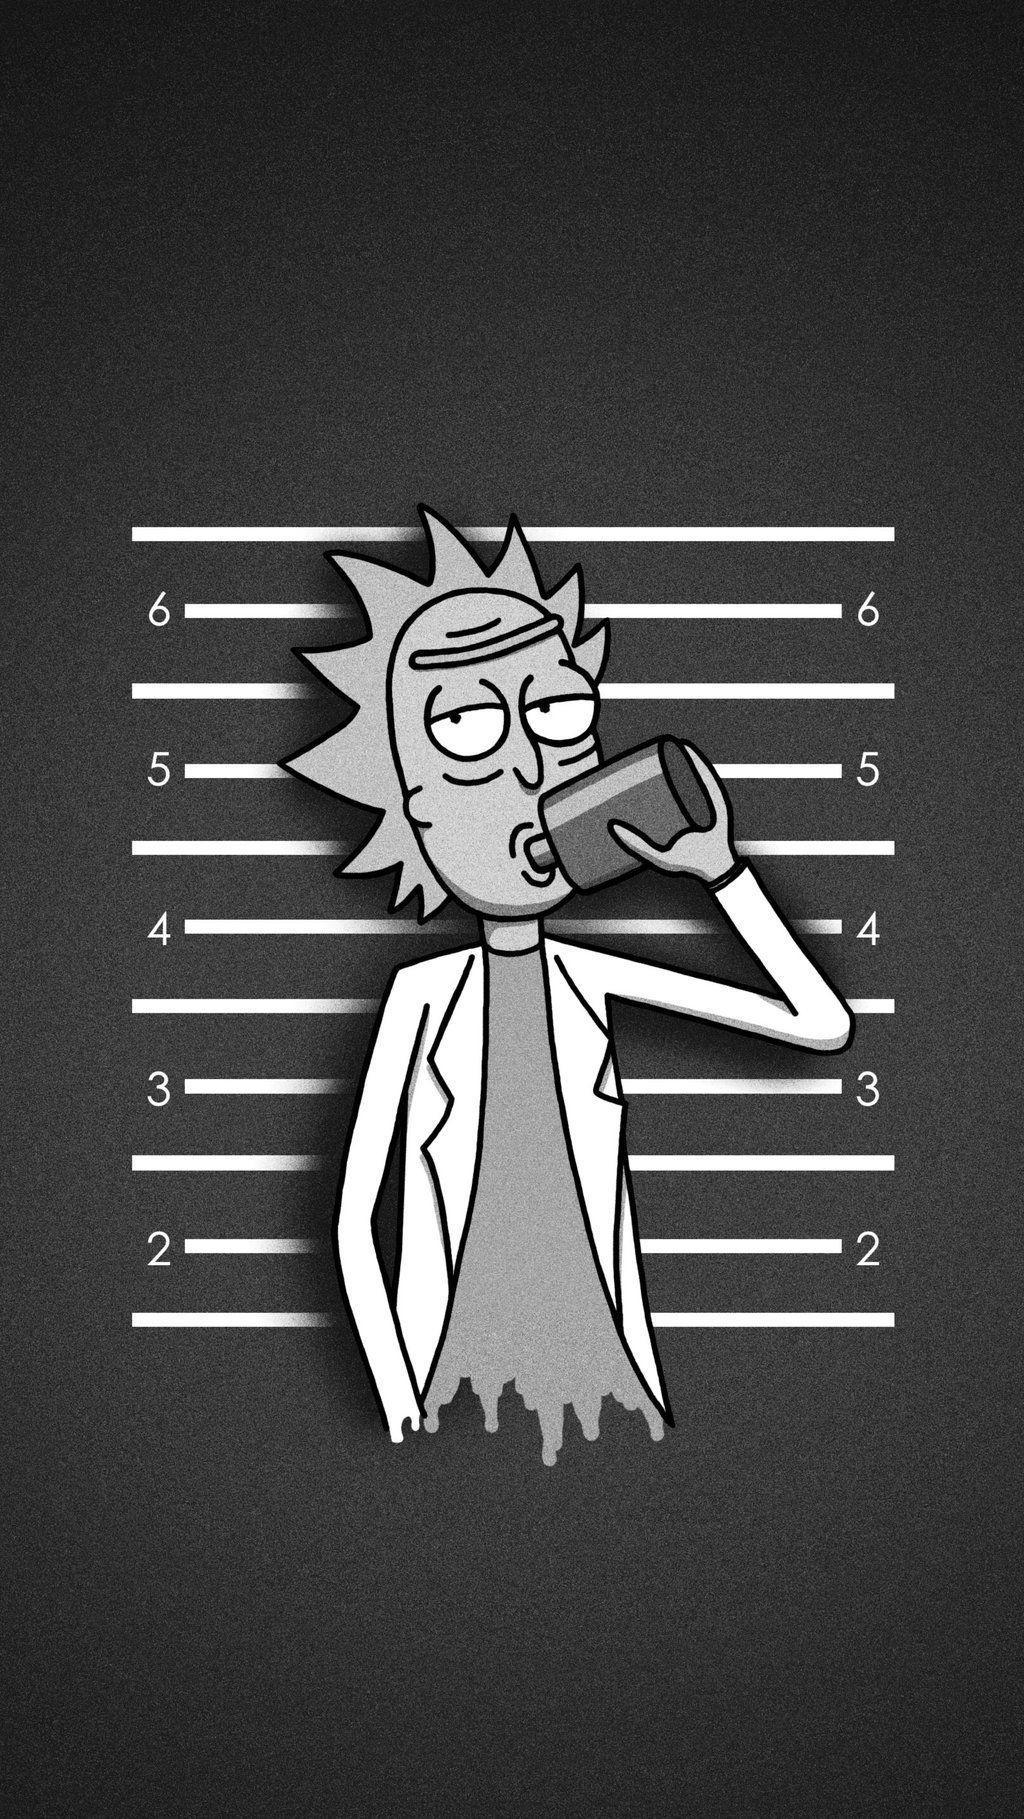 Depressing Cartoon Wallpapers Top Free Depressing Cartoon